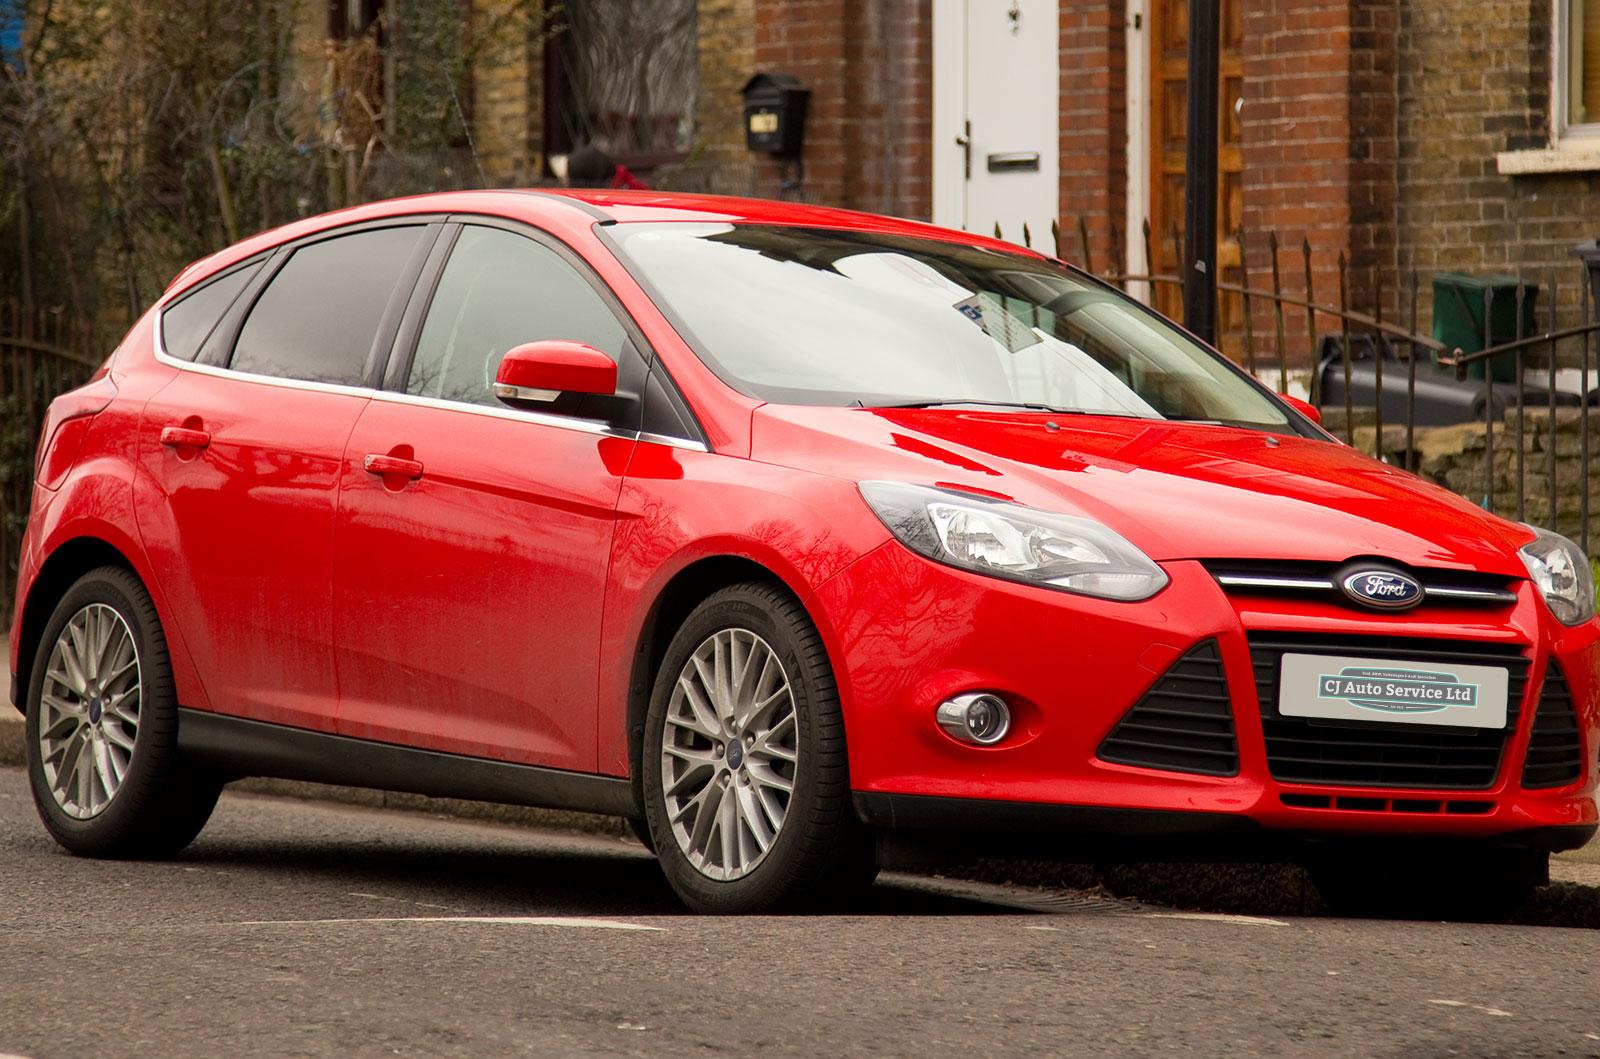 Ford Repairs in Warrington